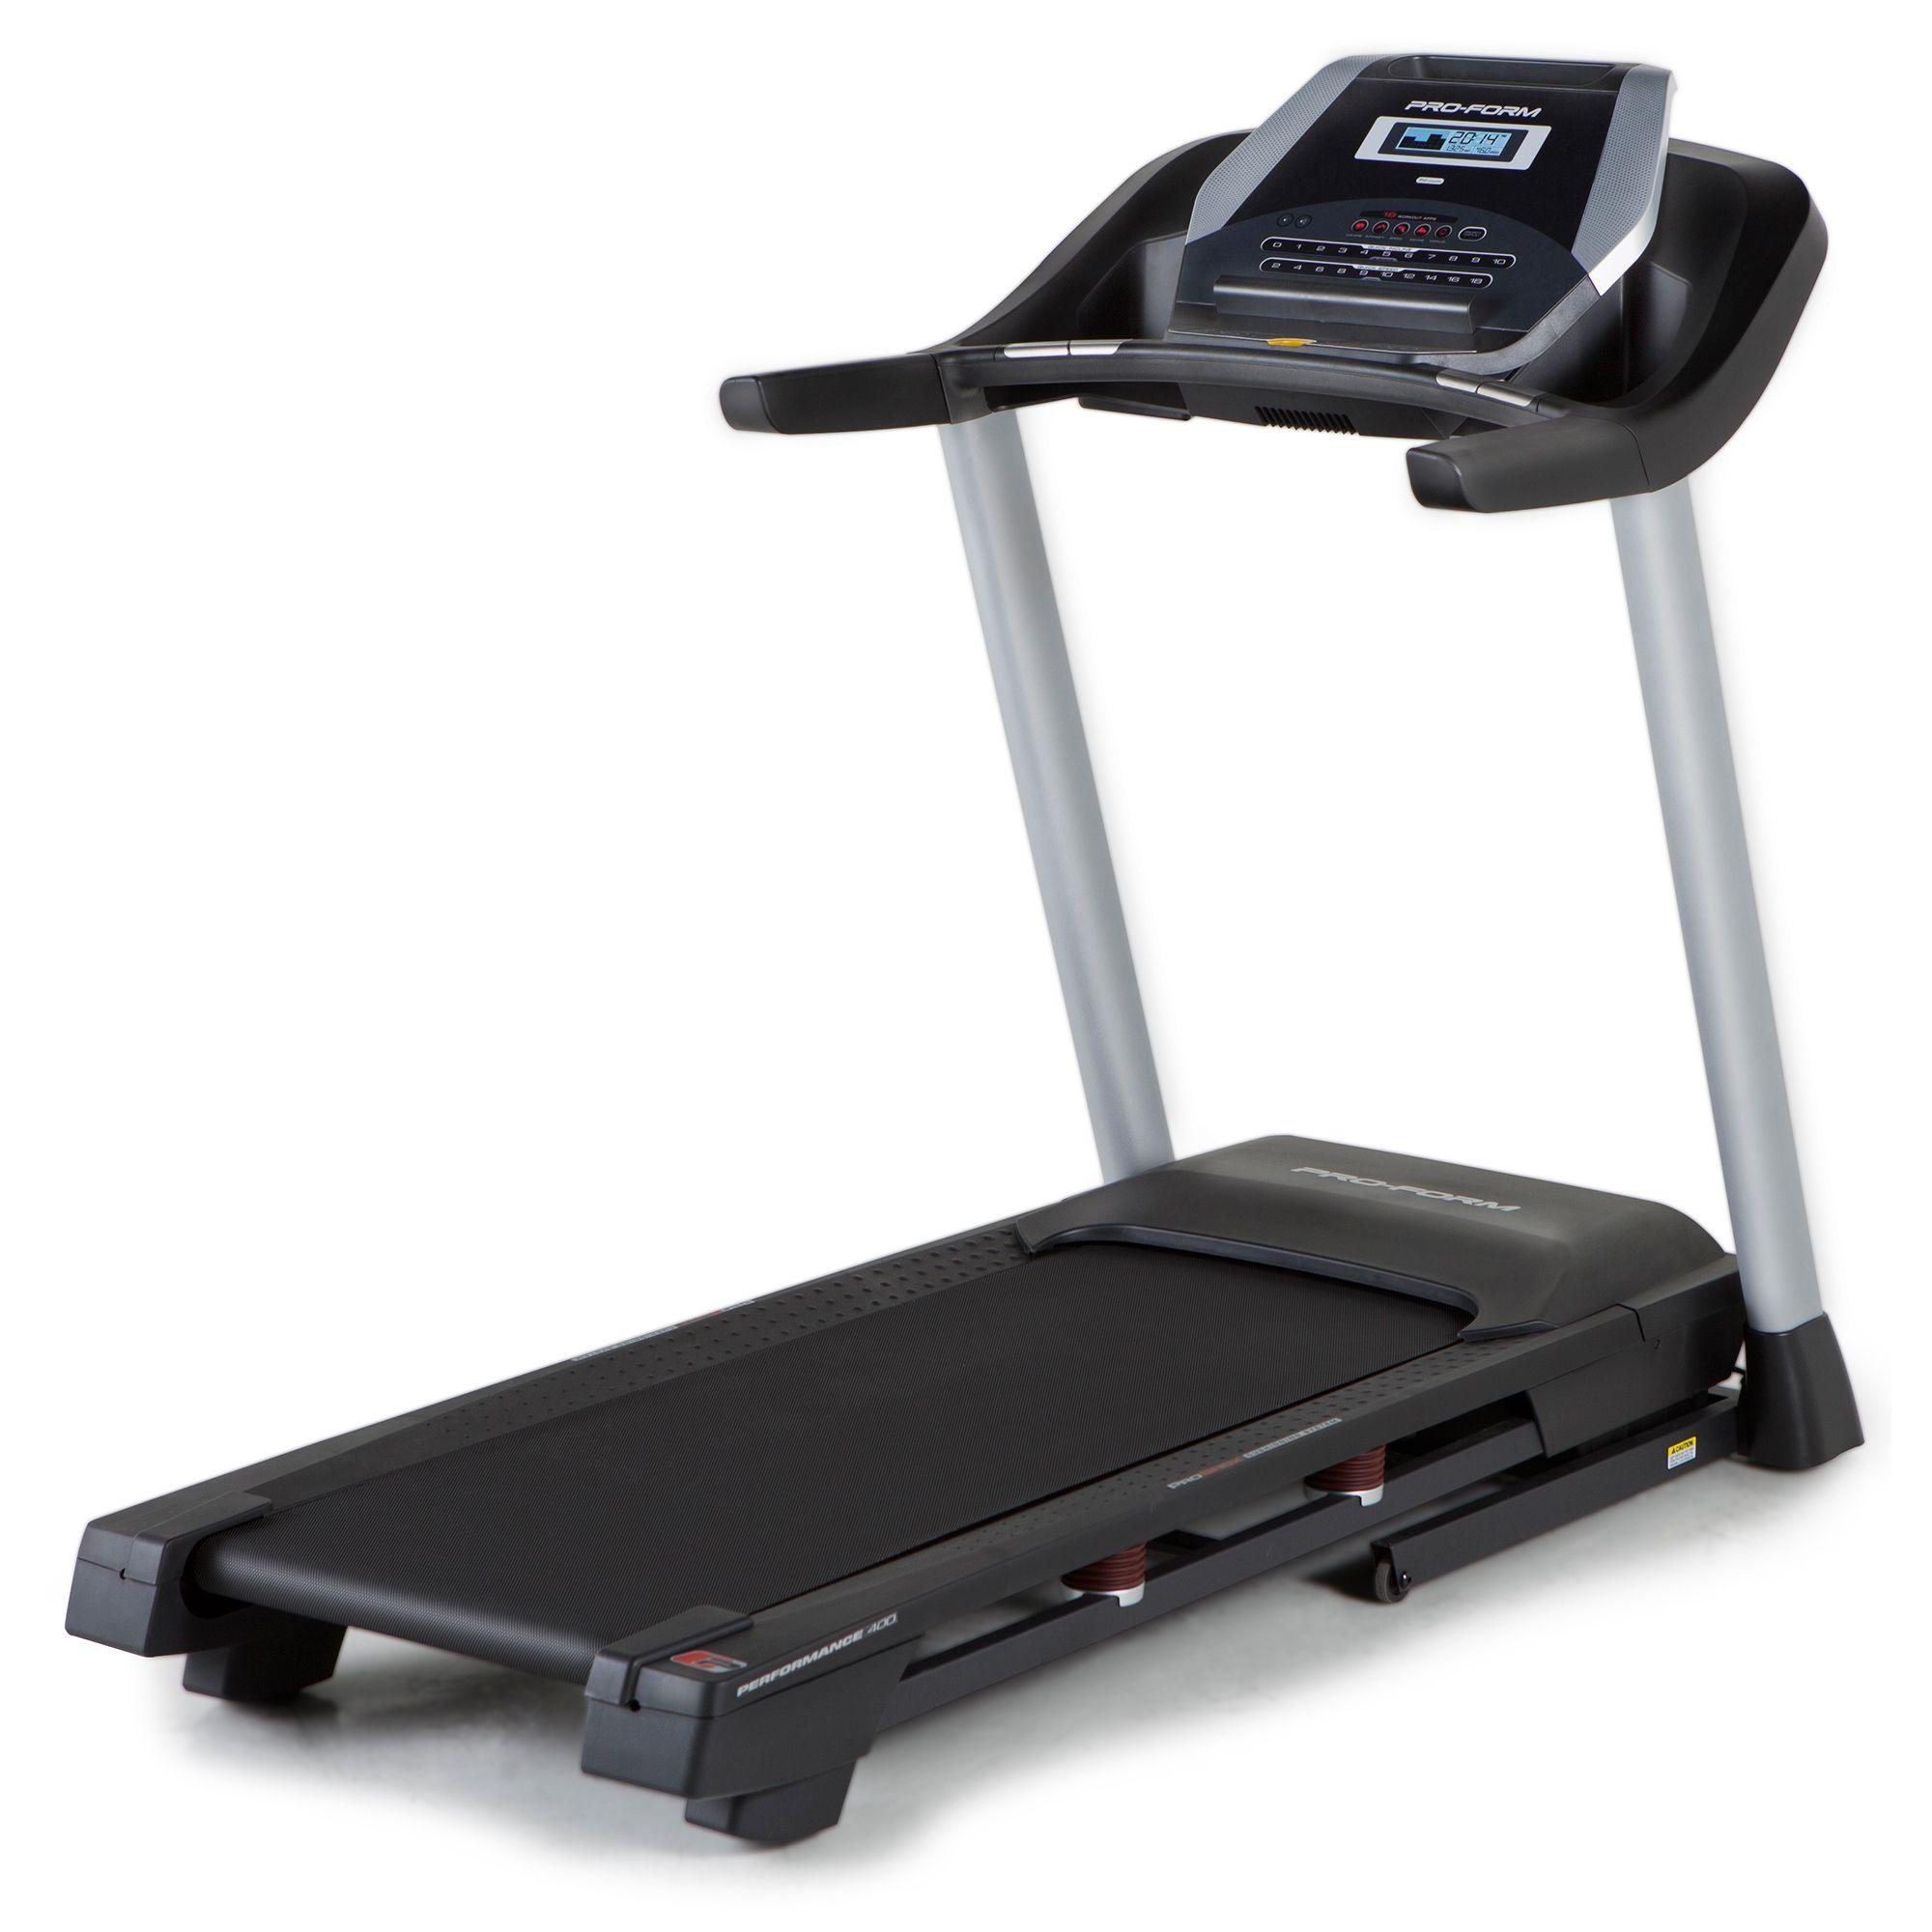 proform_endurance_m7_treadmill_proform_endurance_m7_treadmill ...